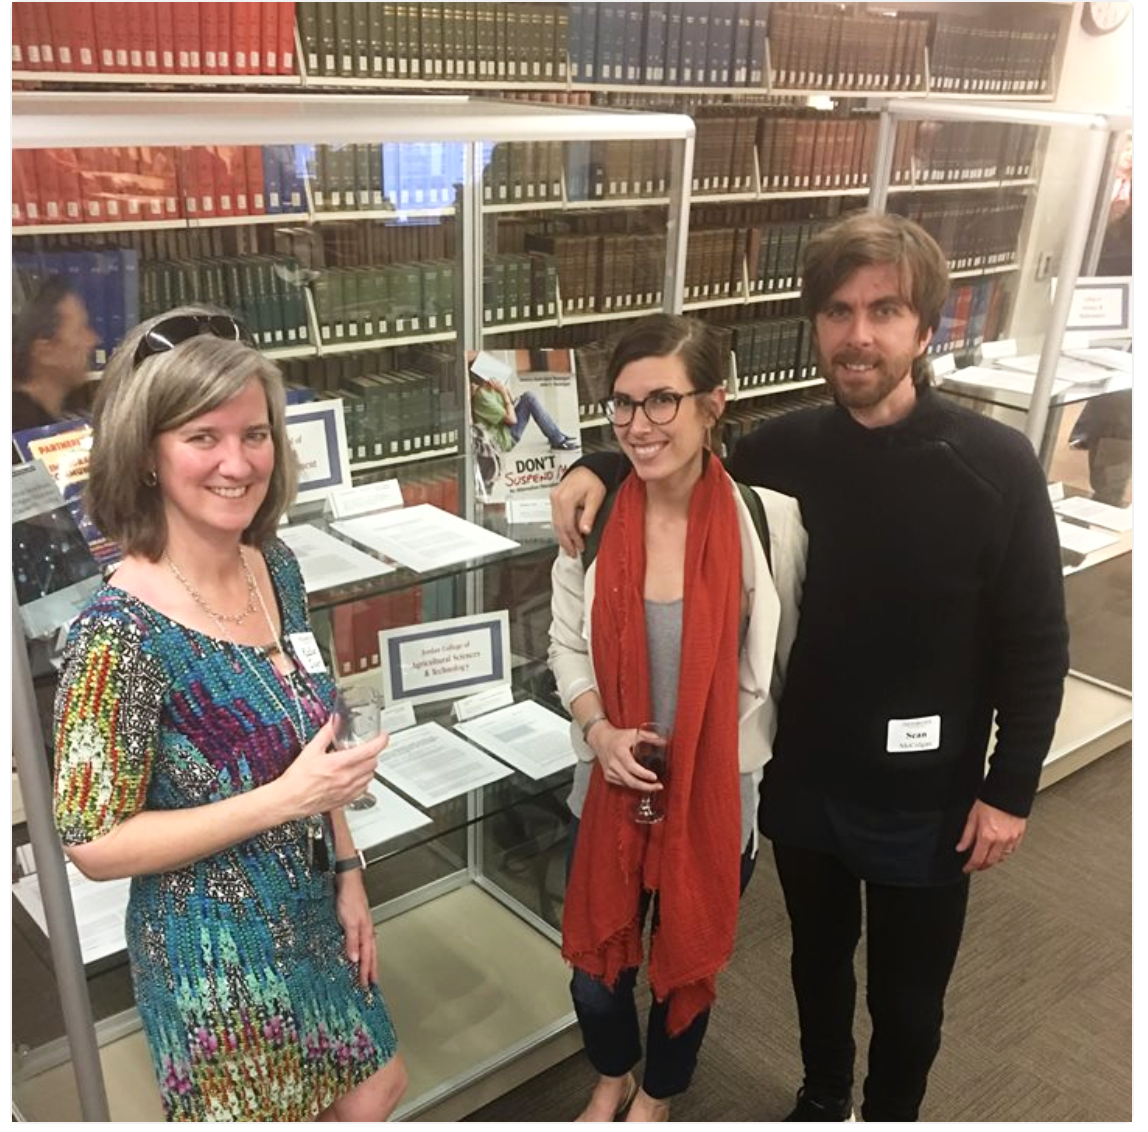 L-R: Dr. Katie Dyer, Dr. Jessica McKenzie, & Sean McColgan